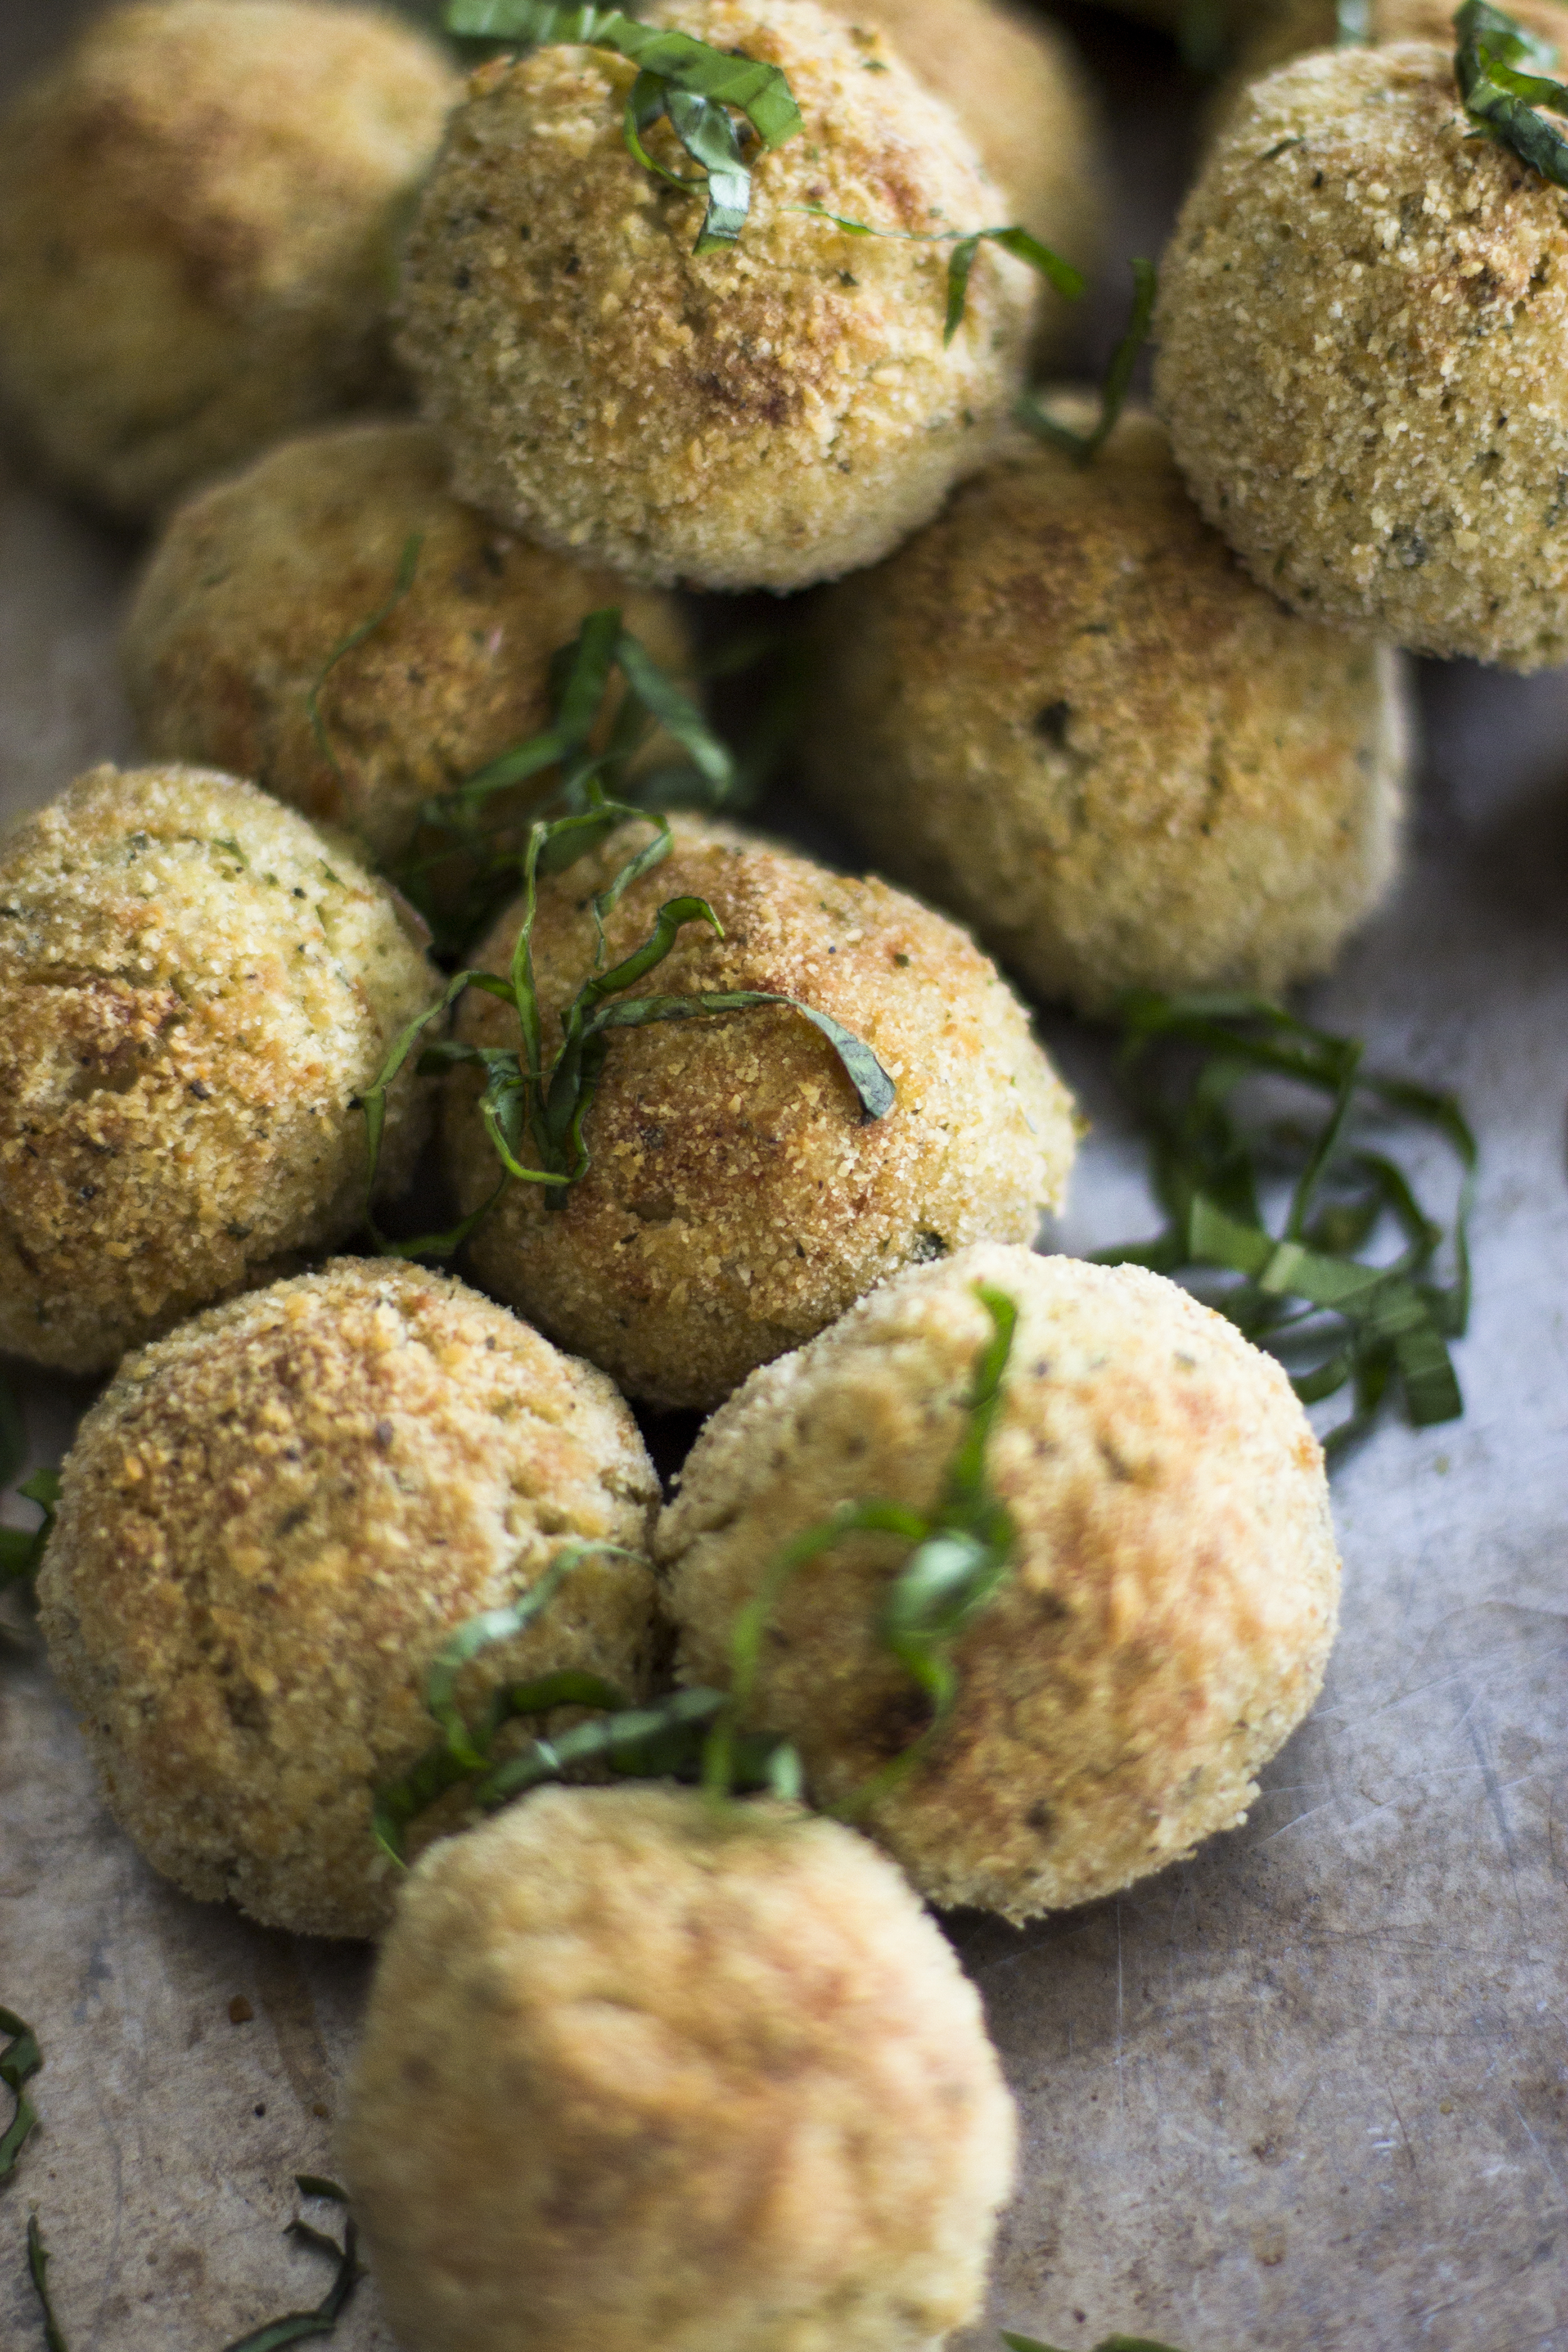 Baked Pesto Risotto Balls: My Diary of Us